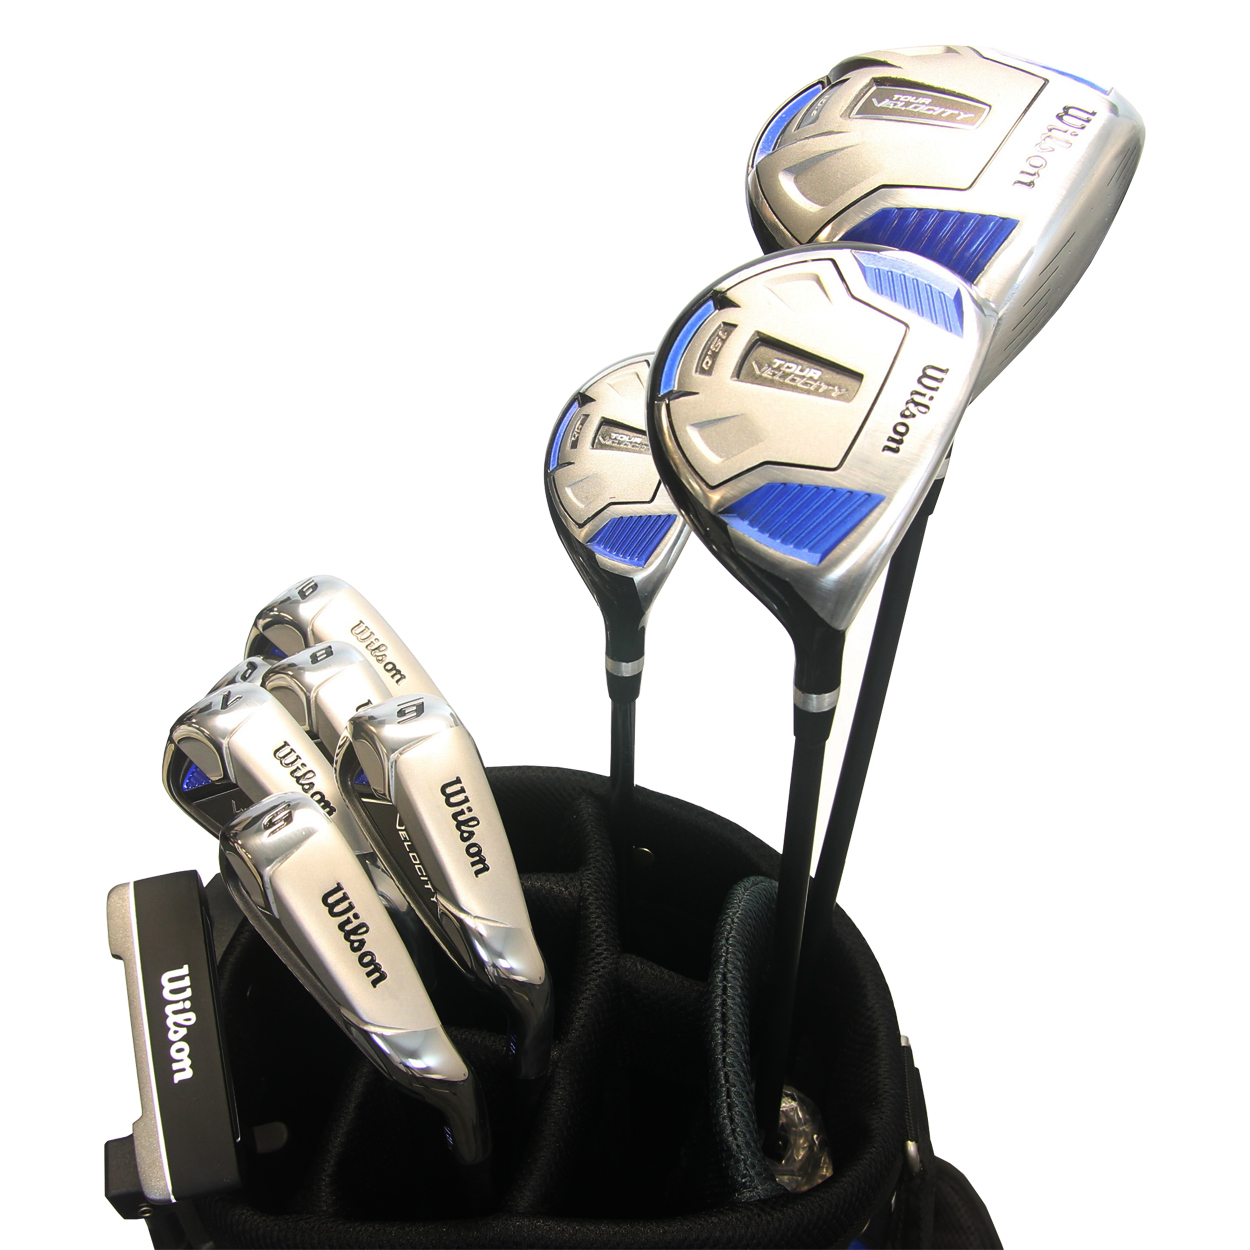 Wilson Tour Velocity Men's 14 Piece Complete Golf Set with Stand Bag WILSON-TOUR-VELOCITY-MEN-SET